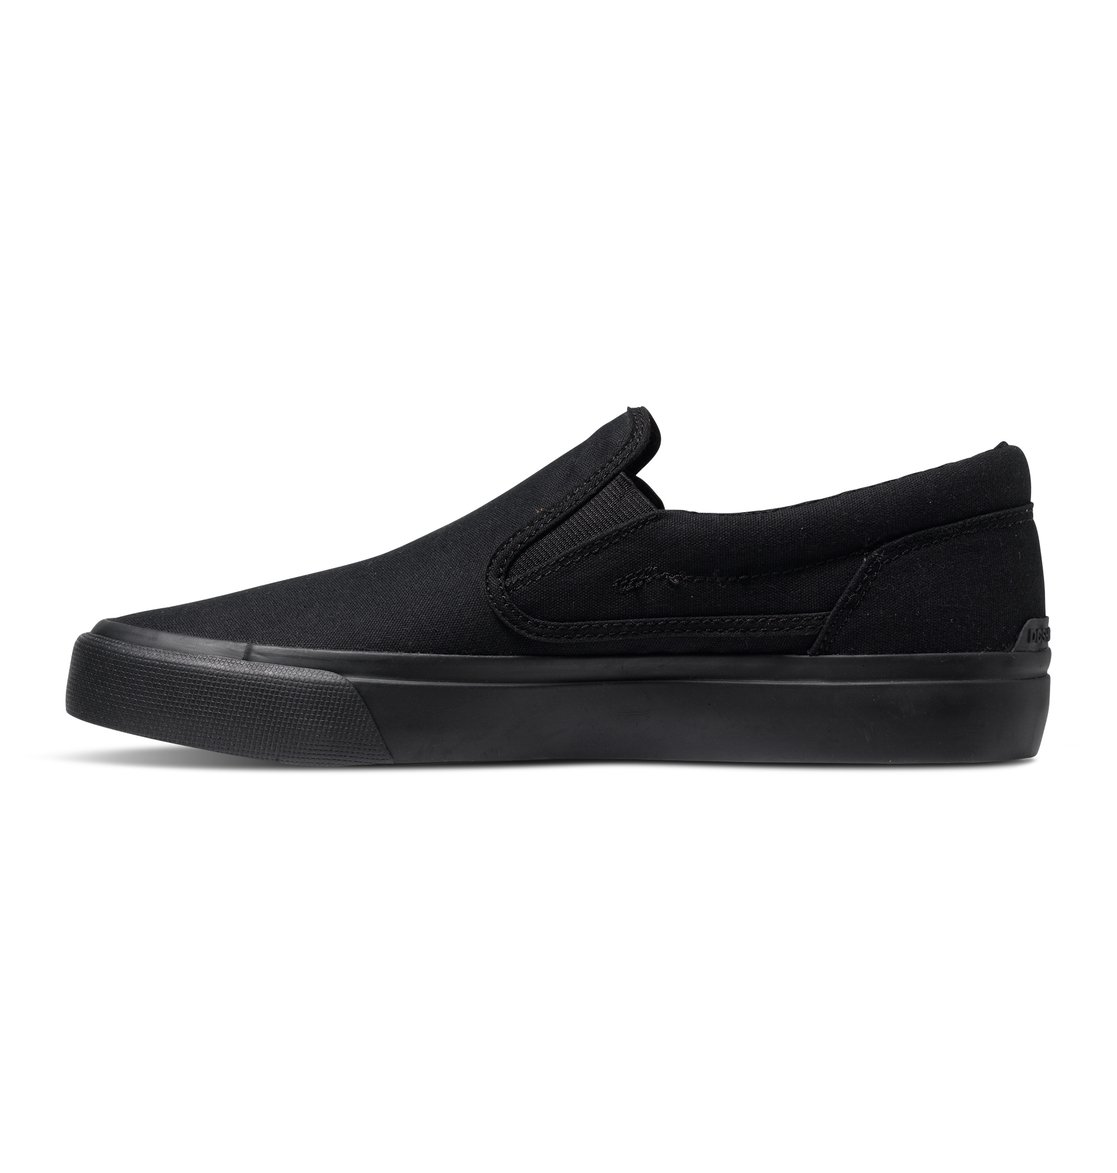 Dc Shoes Trase Slip-On Tx Se Zapatilla Sin Cordones, Color: Navy/Gum, Talla: 39 EU / 7 US / 6 UK